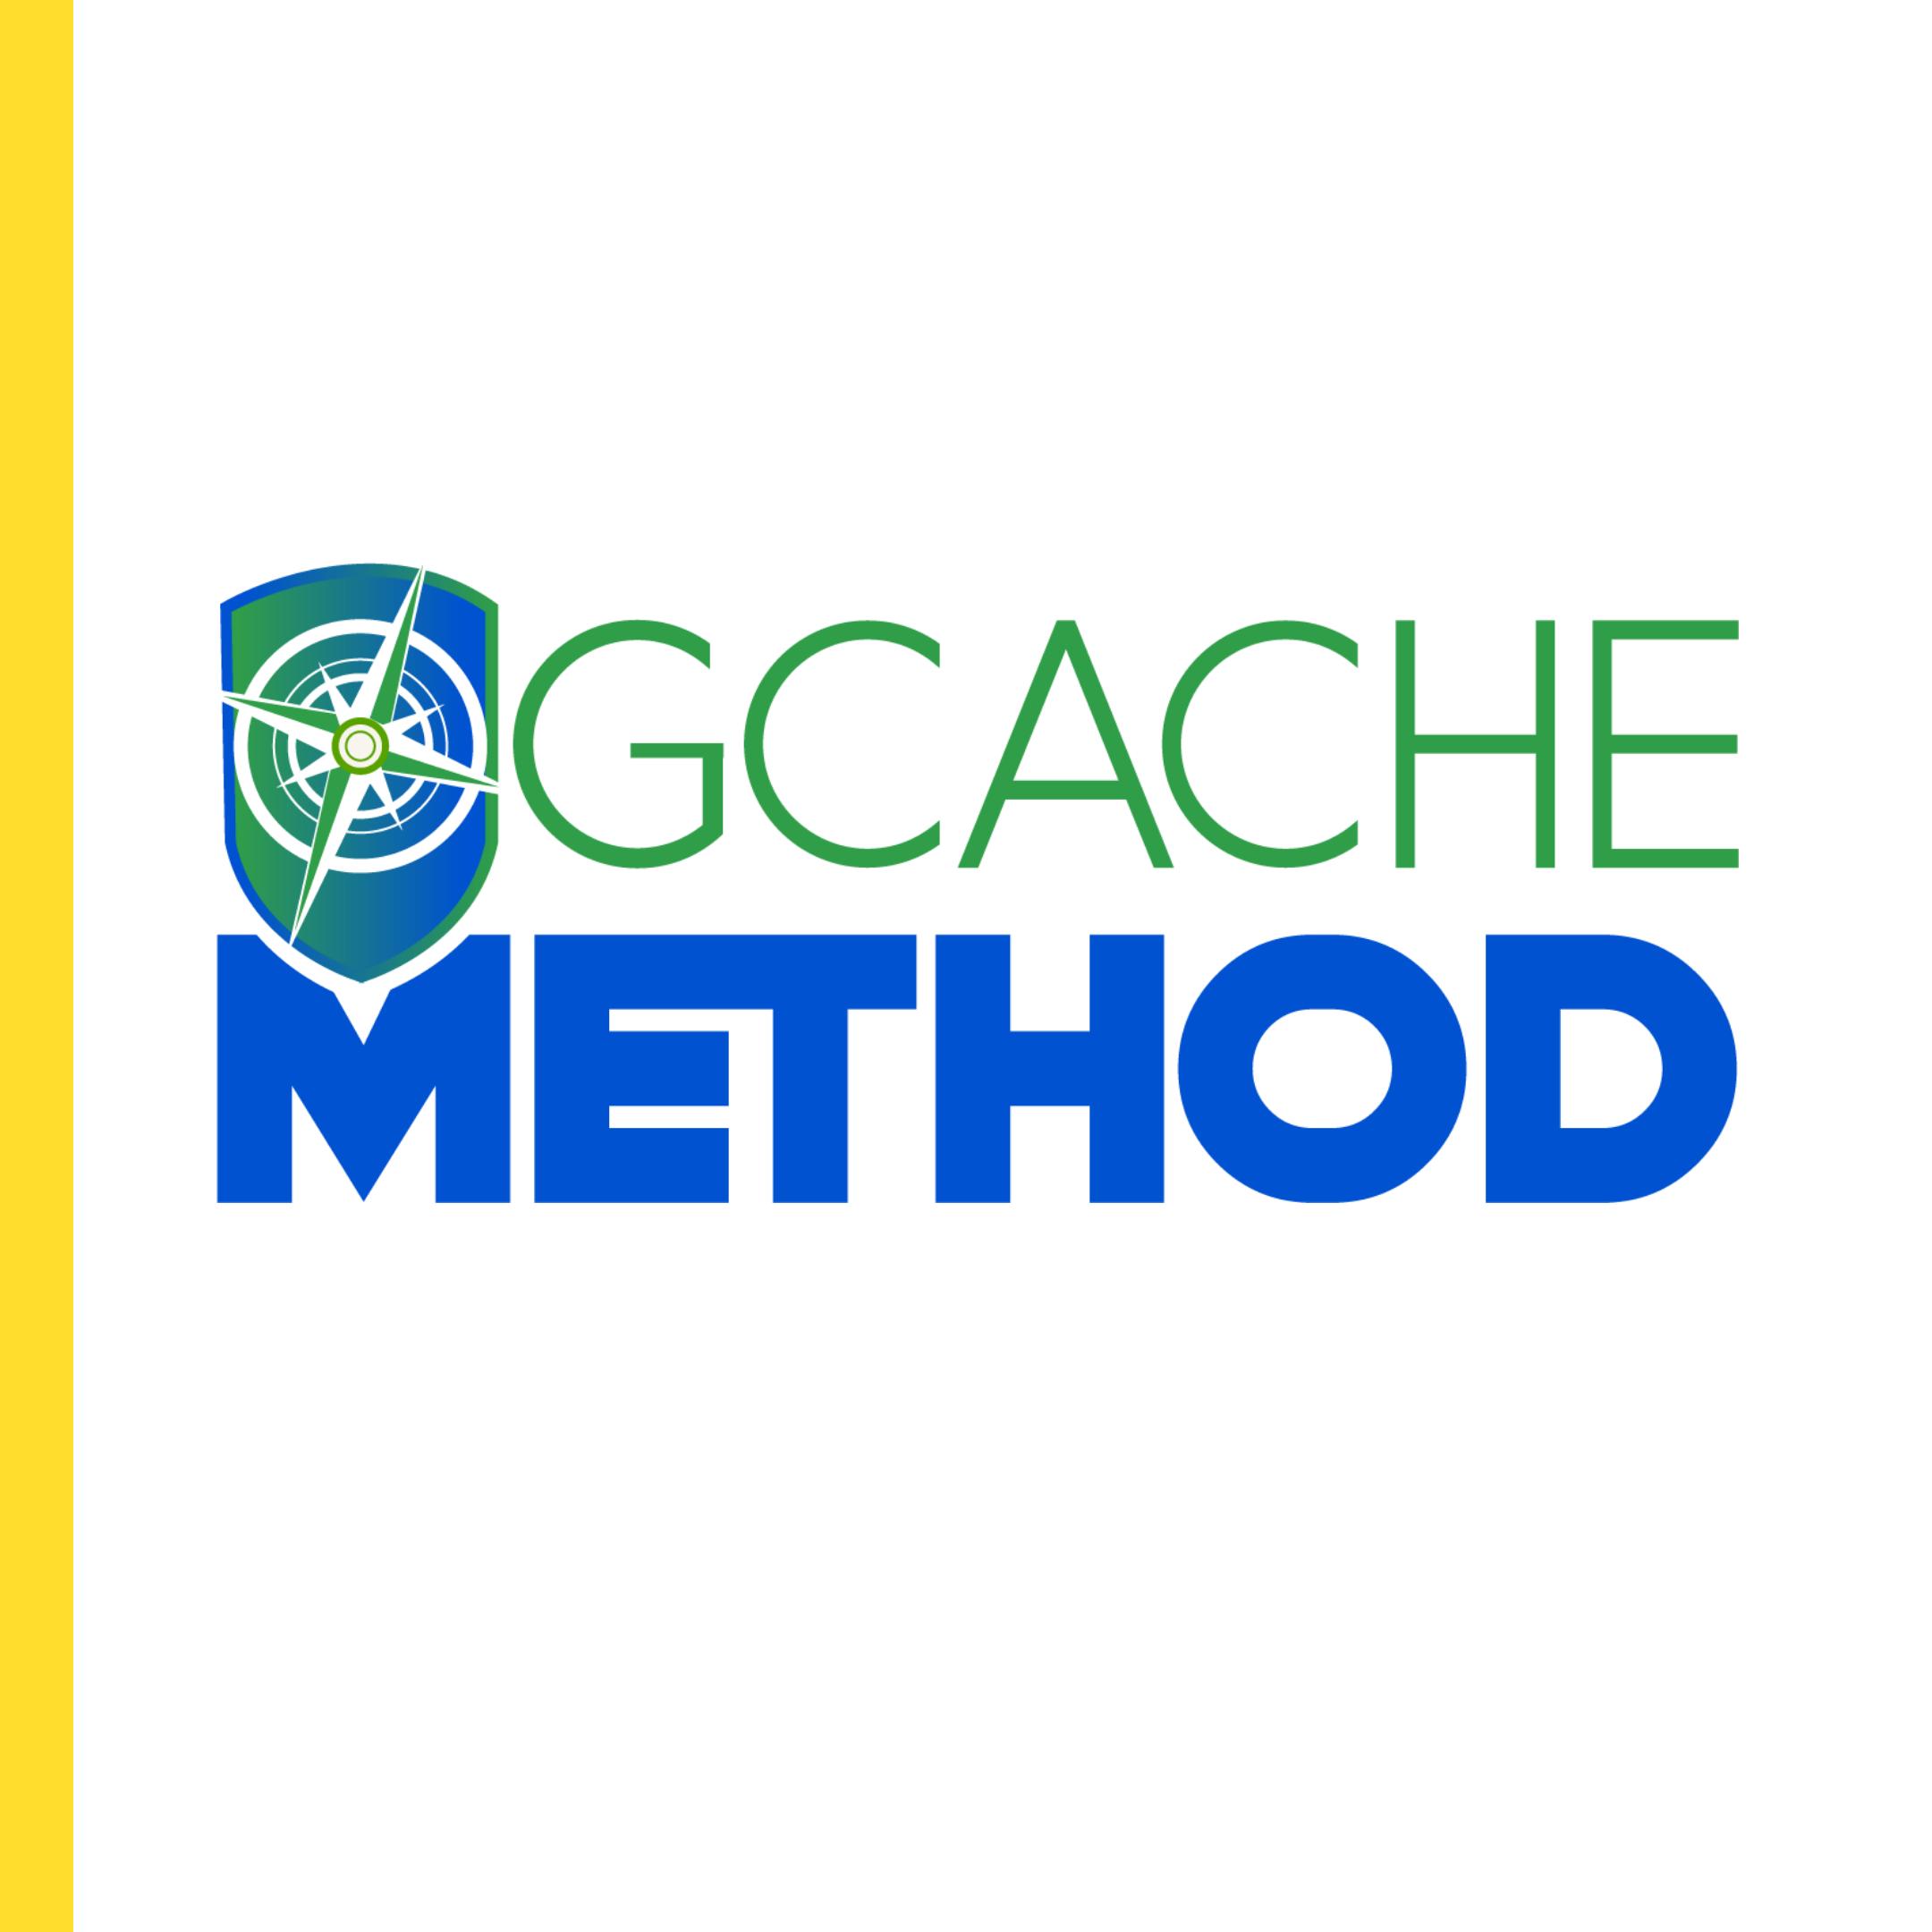 Geocaching method